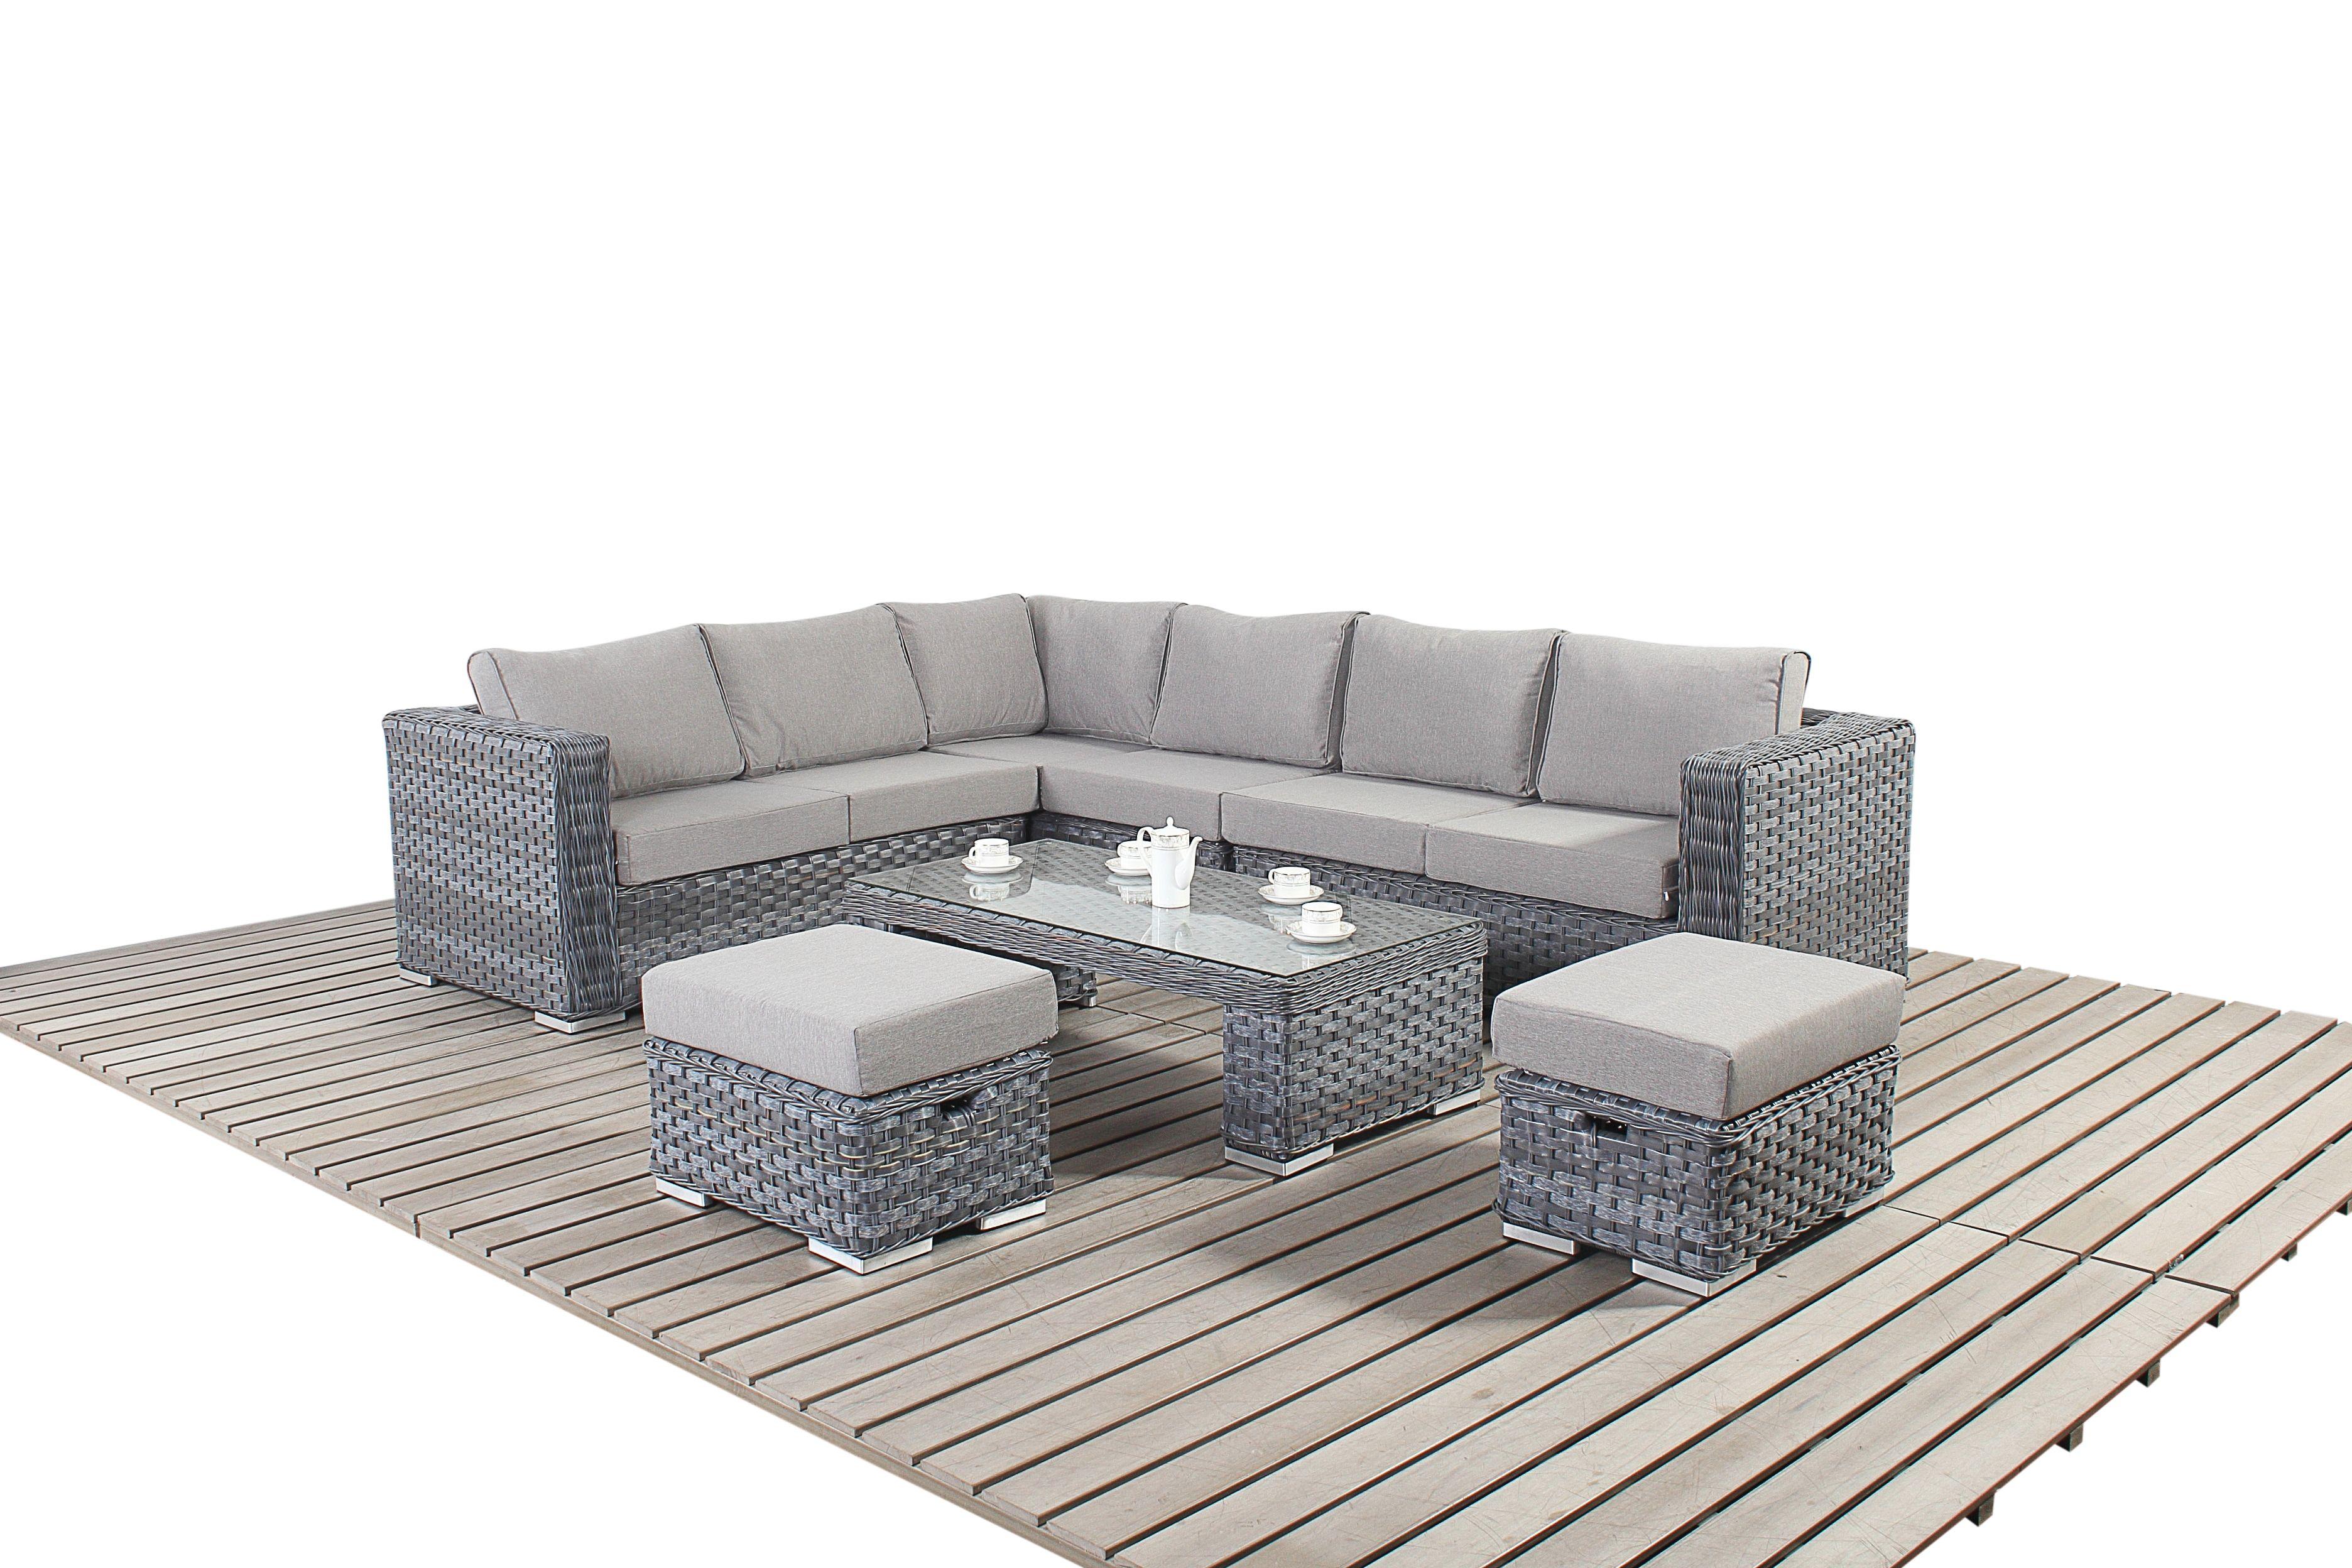 Surprising Port Royal Platinum Grey Table Modular Corner Sofa Rattan Machost Co Dining Chair Design Ideas Machostcouk